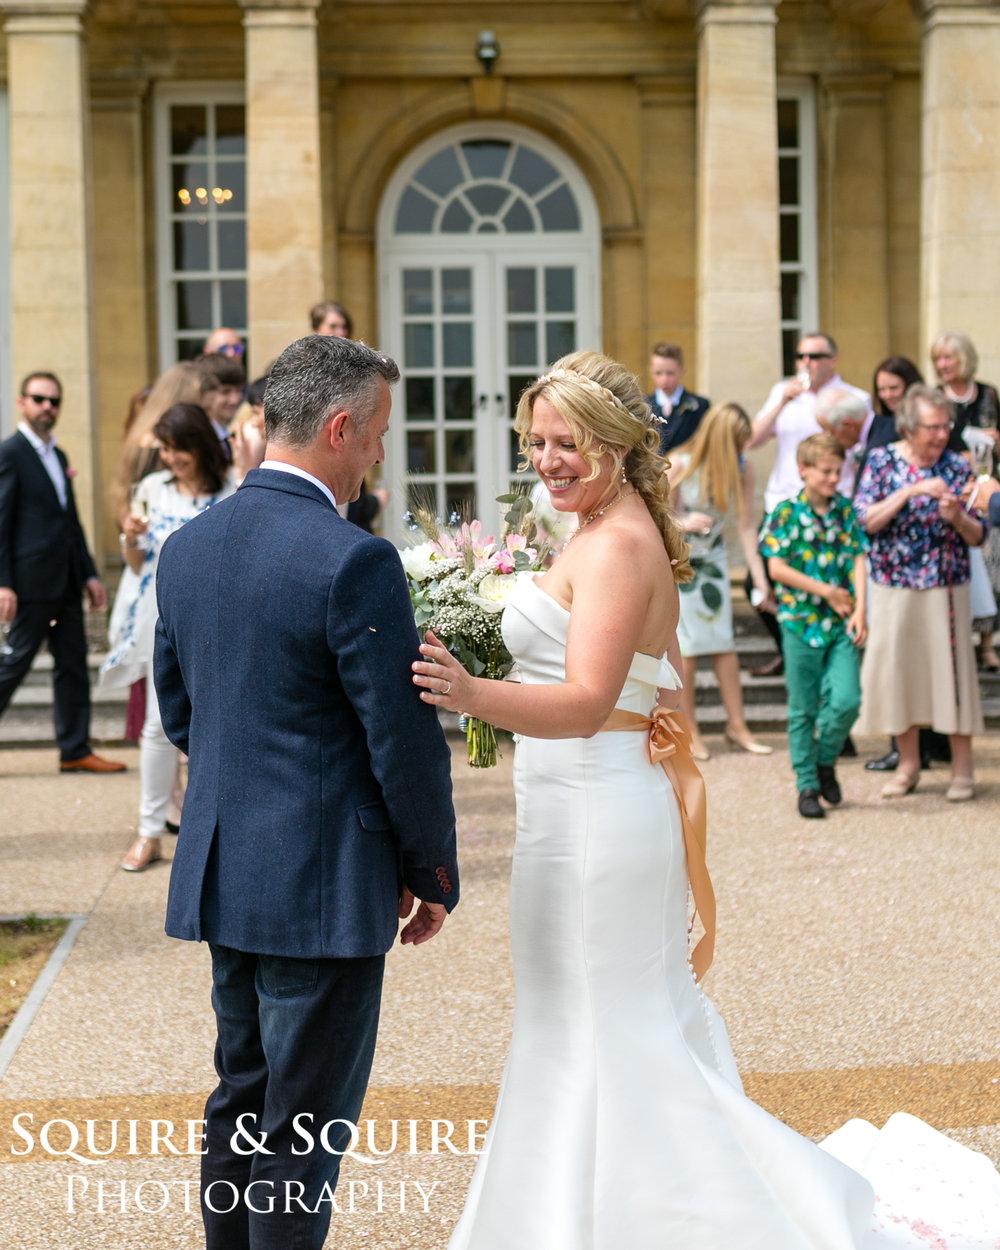 wedding_photography_catthorpe Manor (51 of 66).jpg